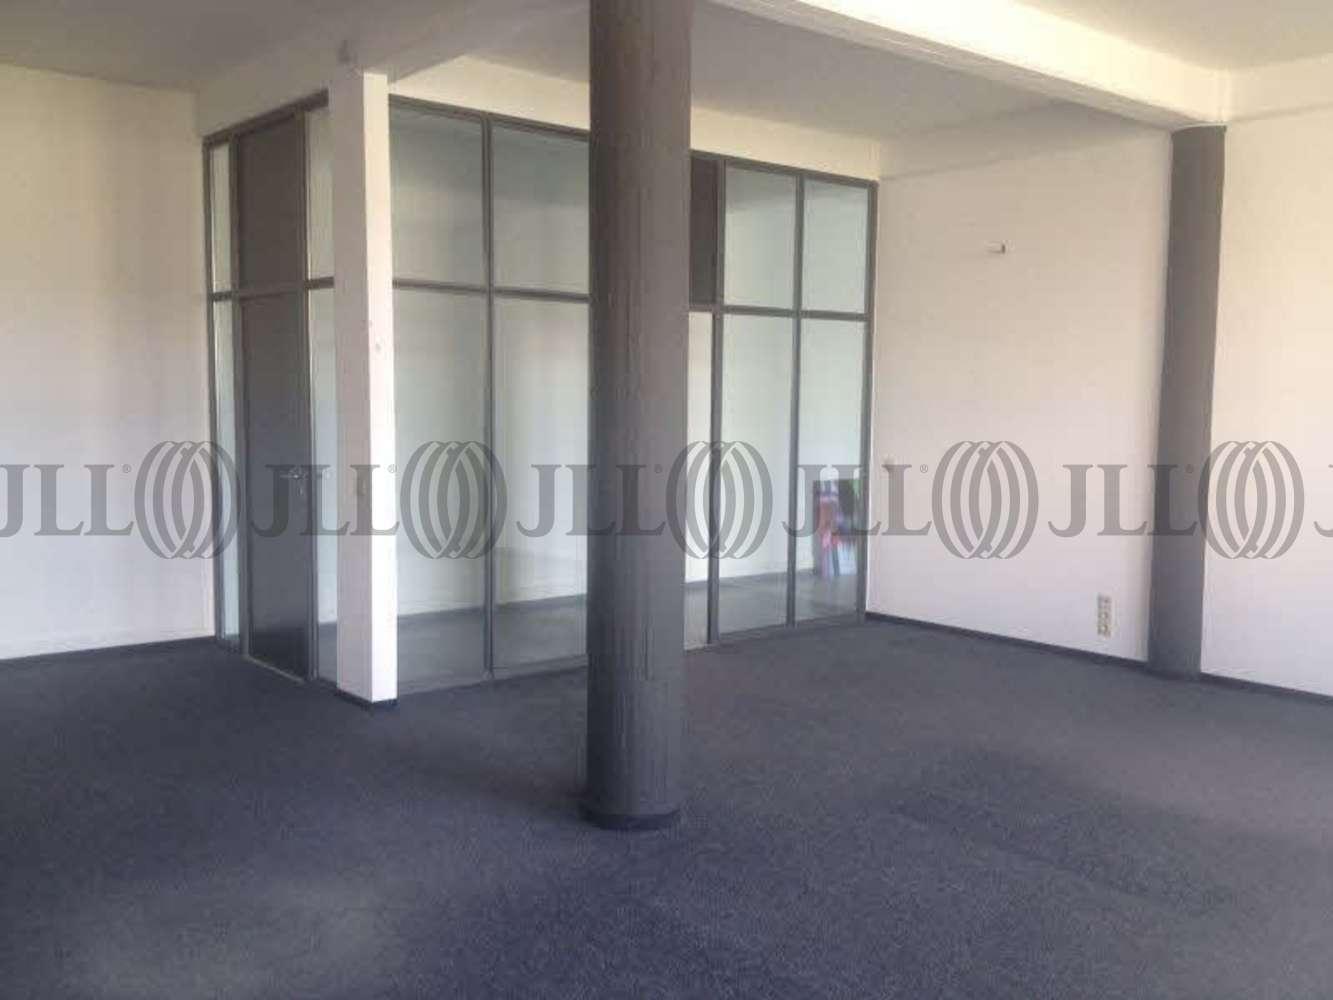 Büros Frankfurt am main, 60489 - Büro - Frankfurt am Main, Rödelheim - F0107 - 9915127